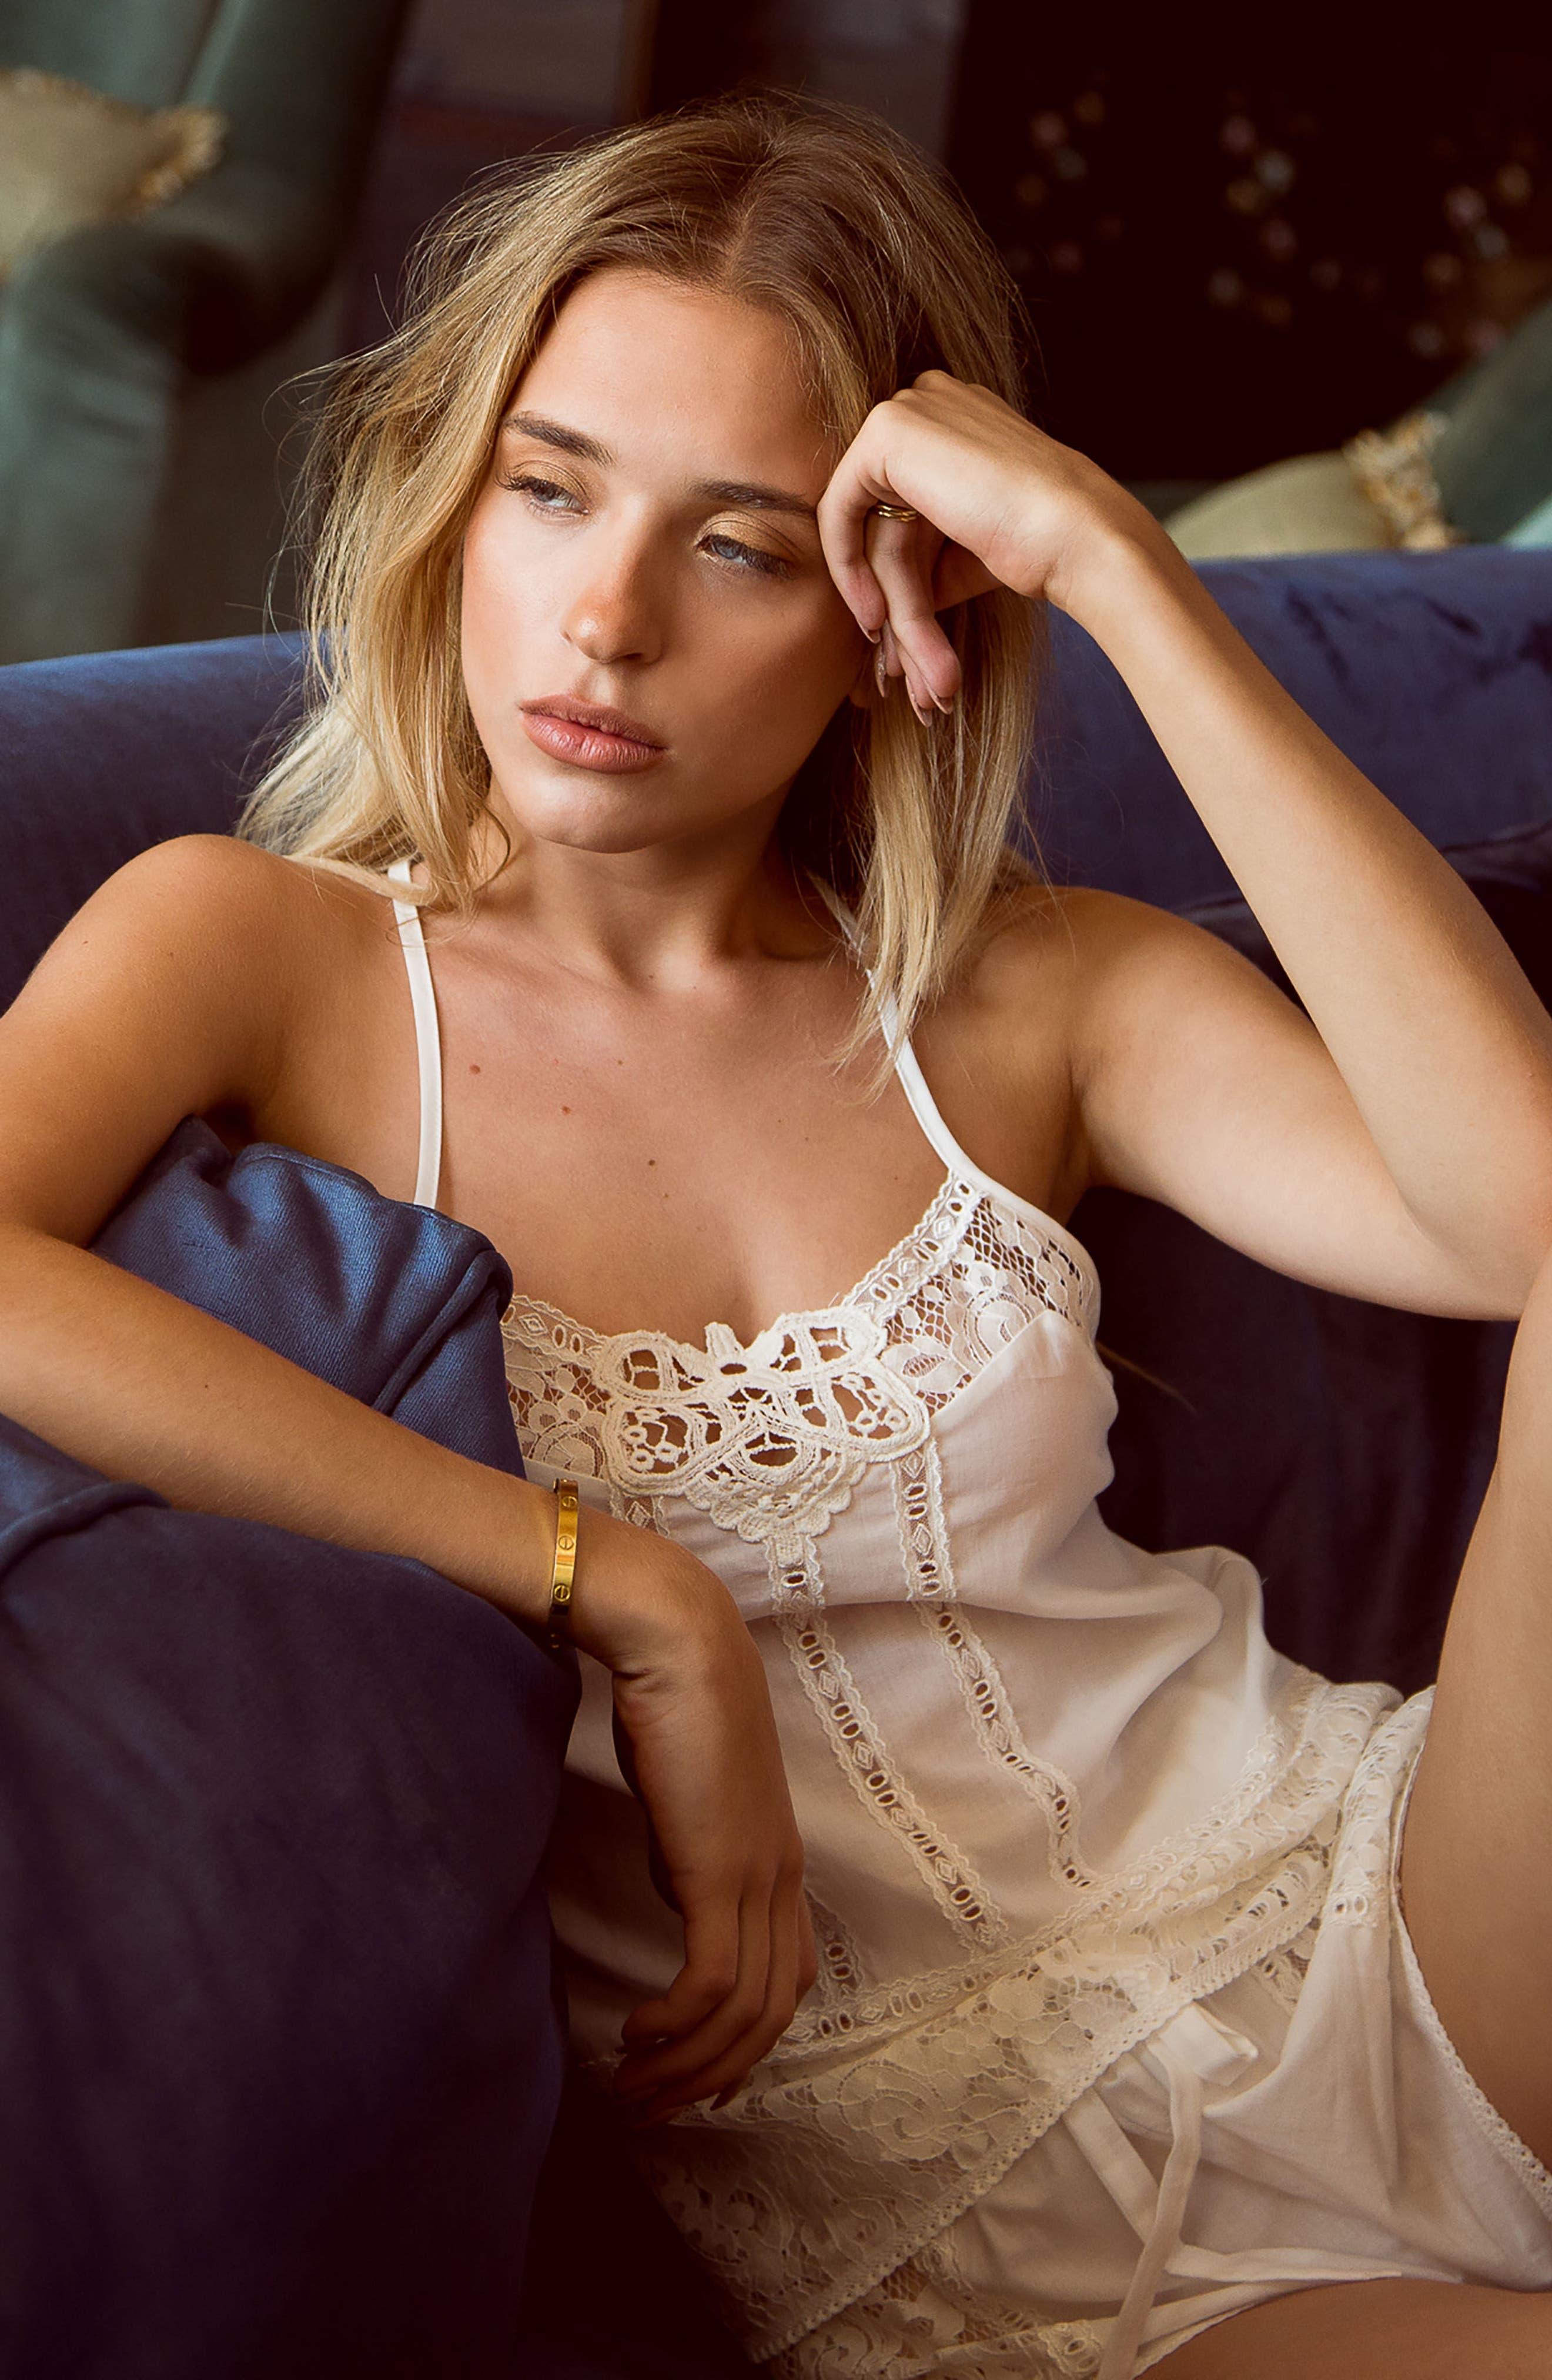 Eyelet Cotton Short Pajamas,                             Alternate thumbnail 7, color,                             Ivory/ Beige